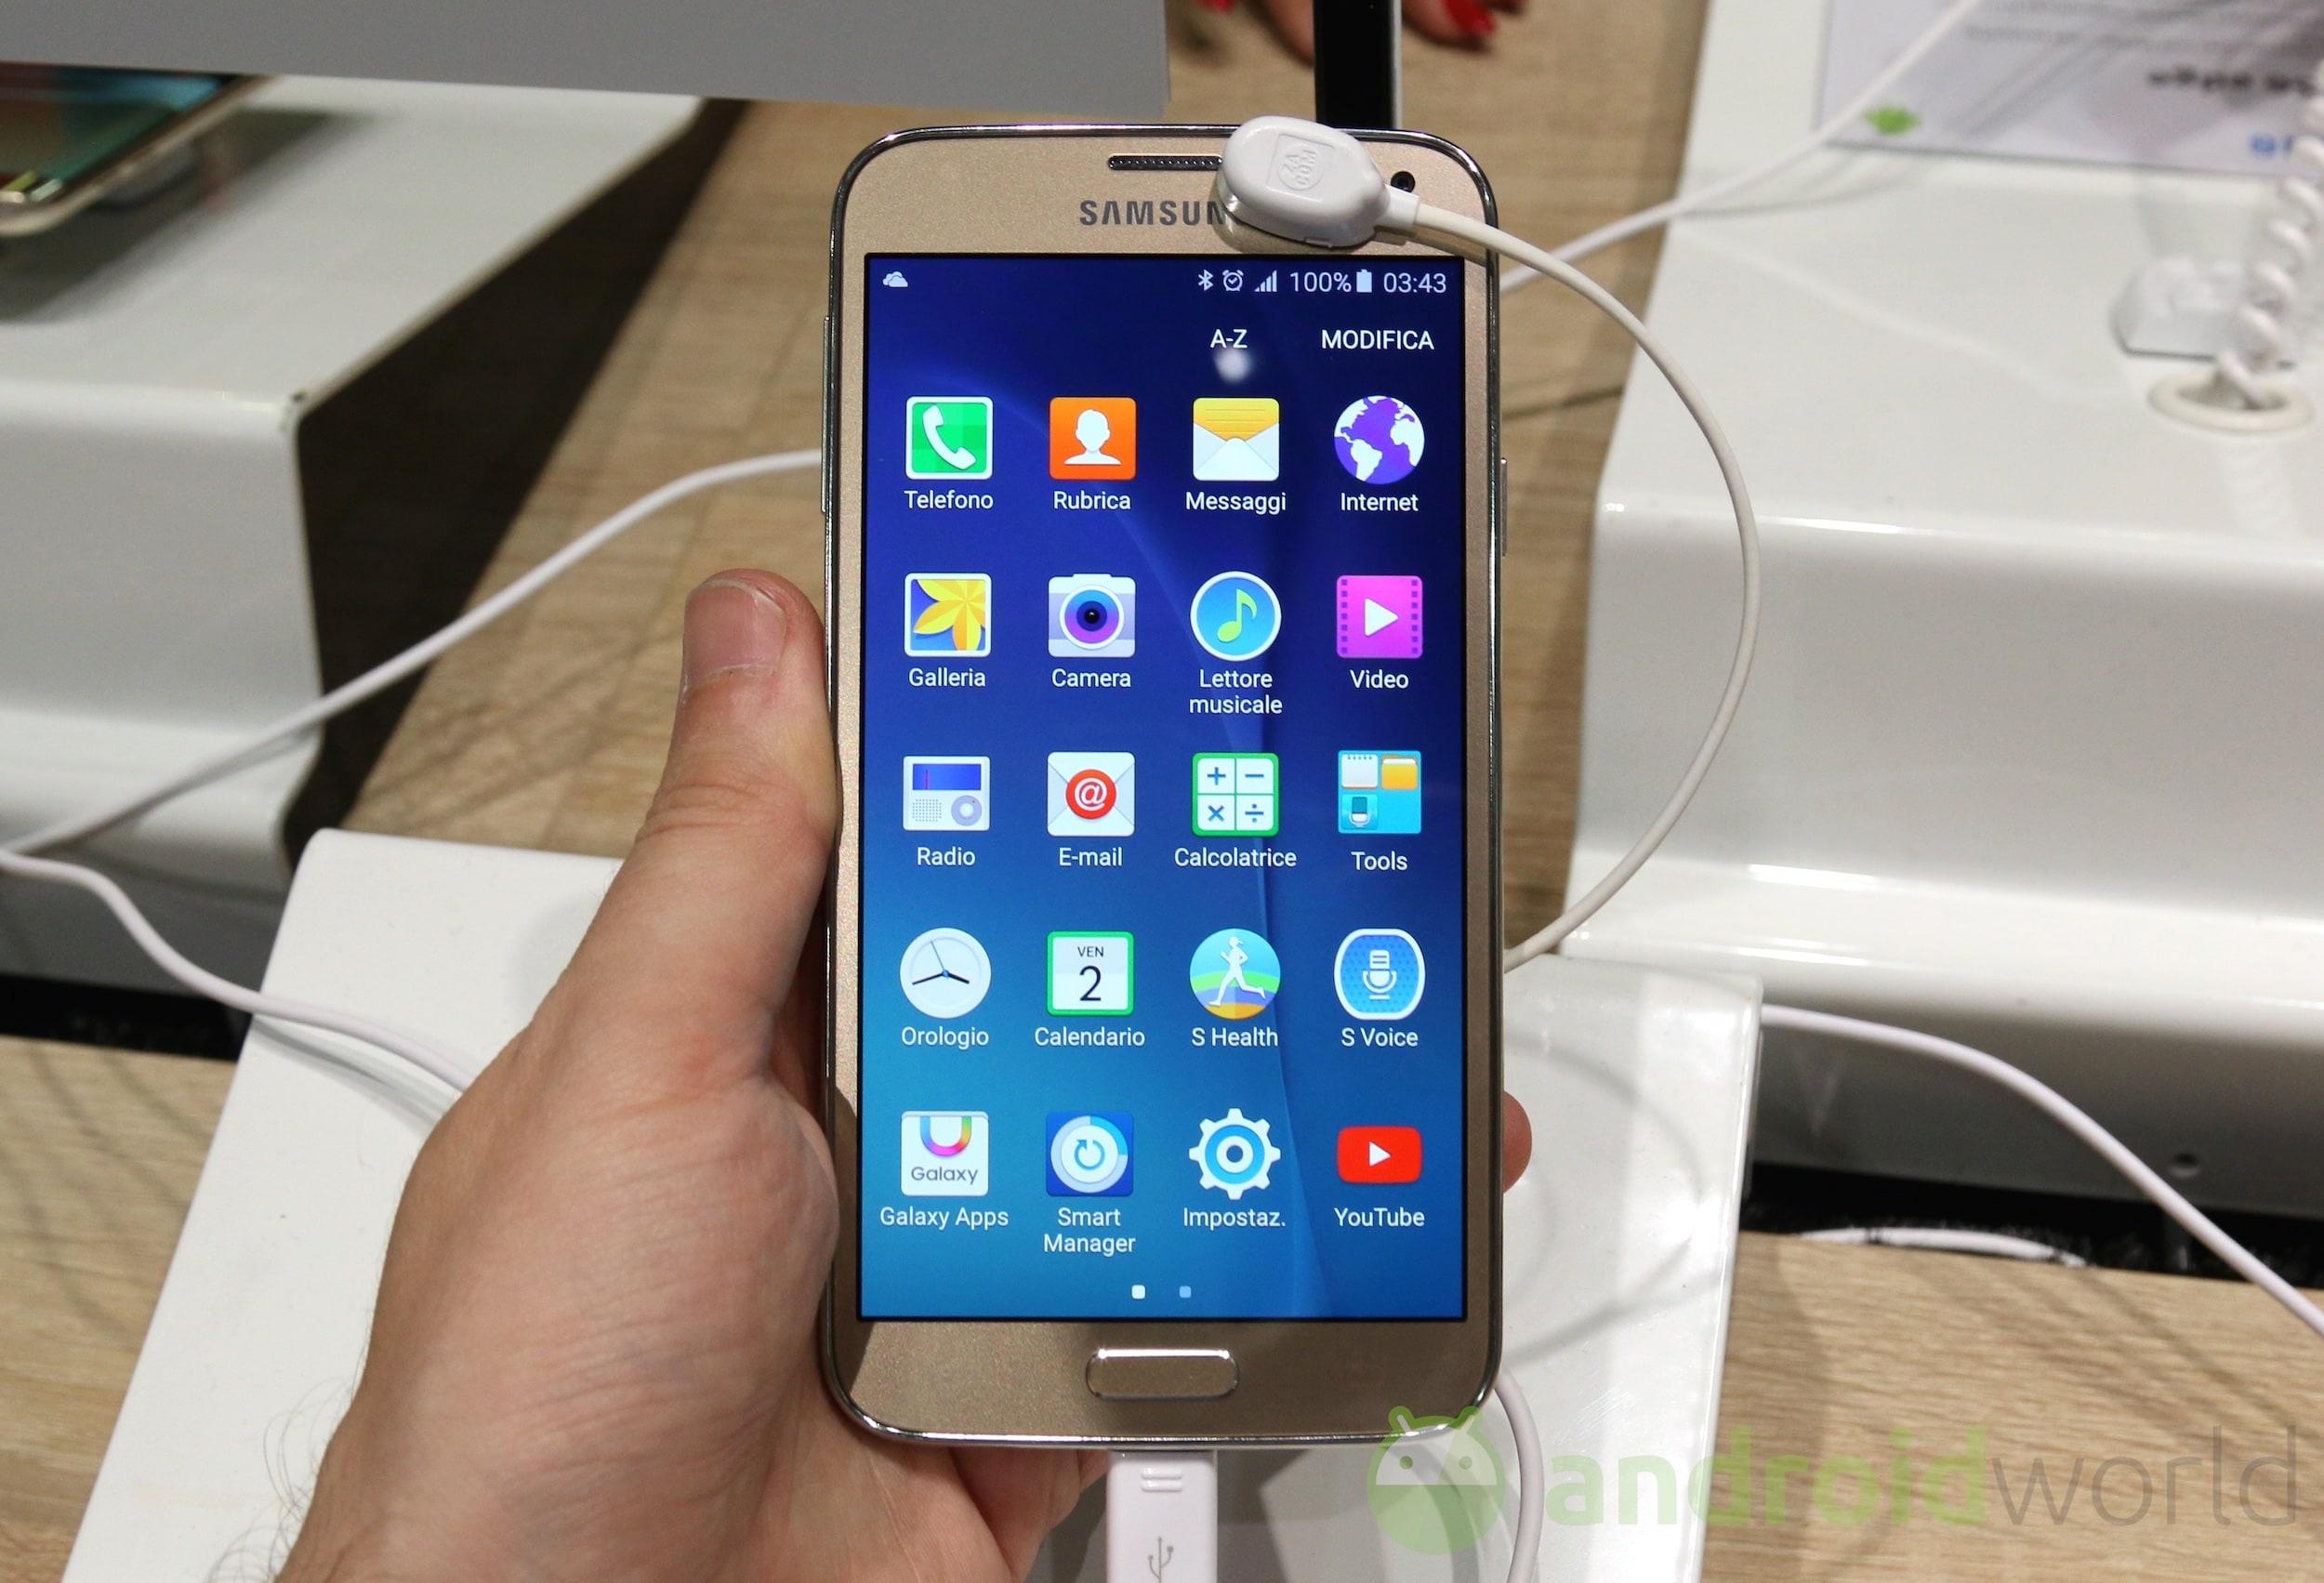 Samsung Galaxy S5 Neo 6 2